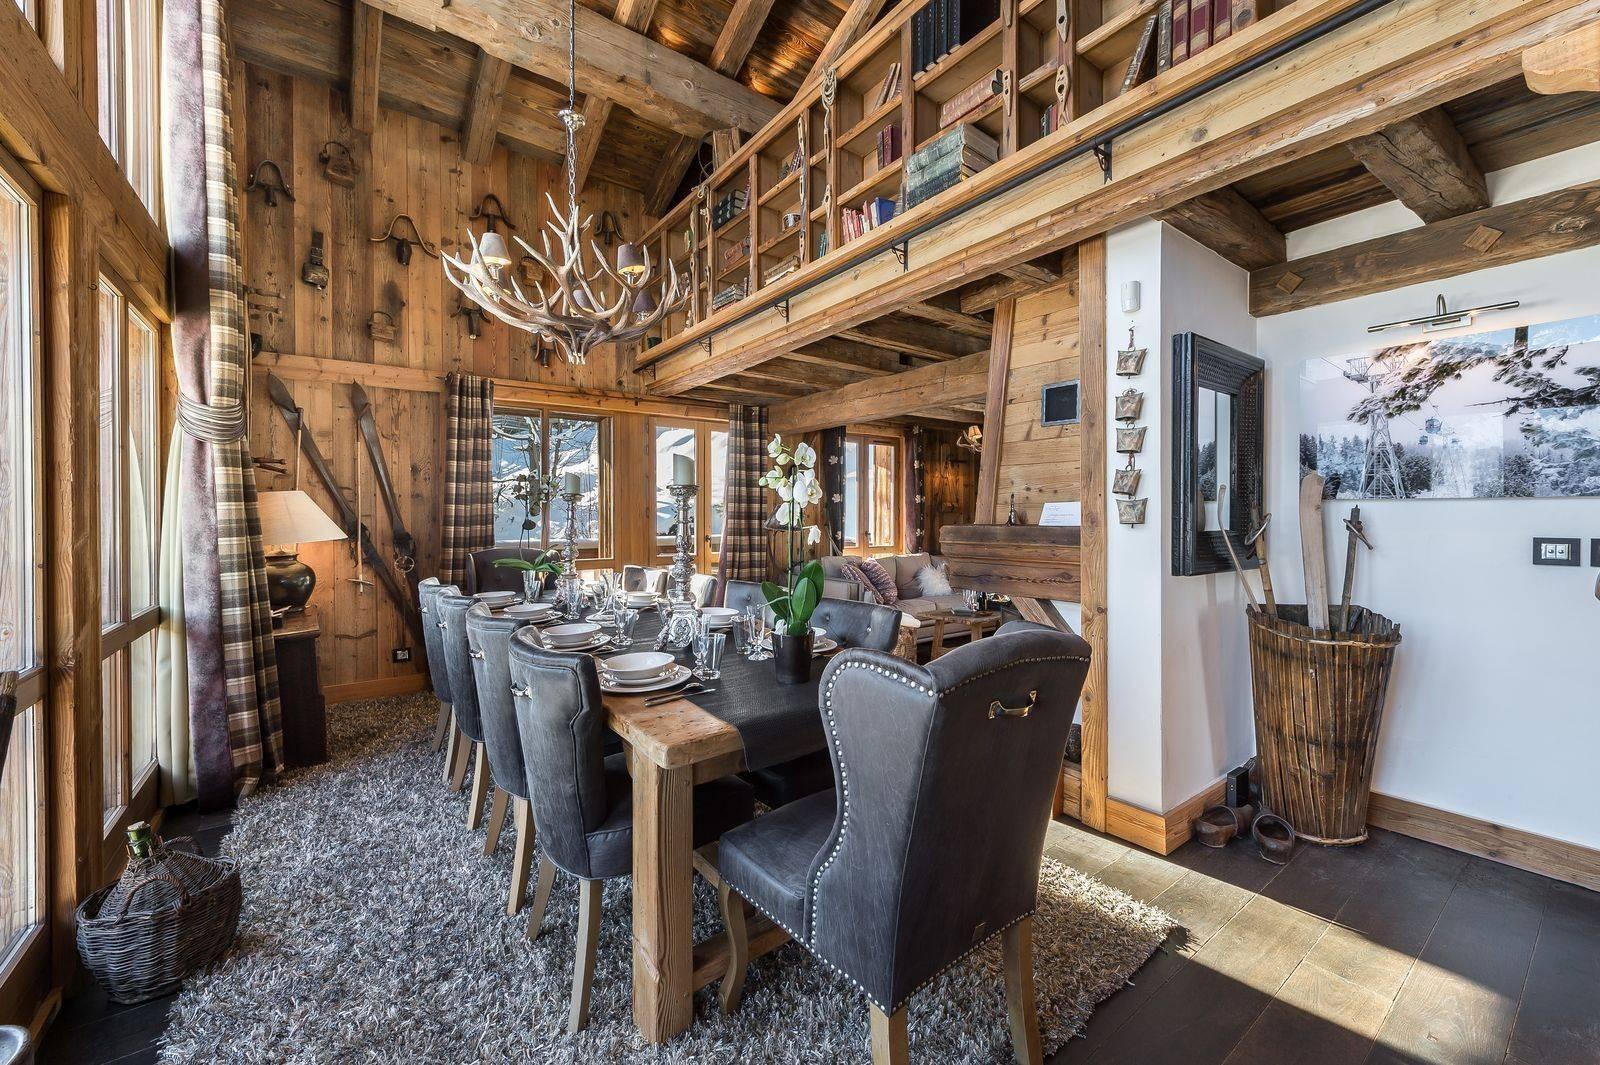 Courchevel 1550 Luxury Rental Chalet Niobite Dining Room